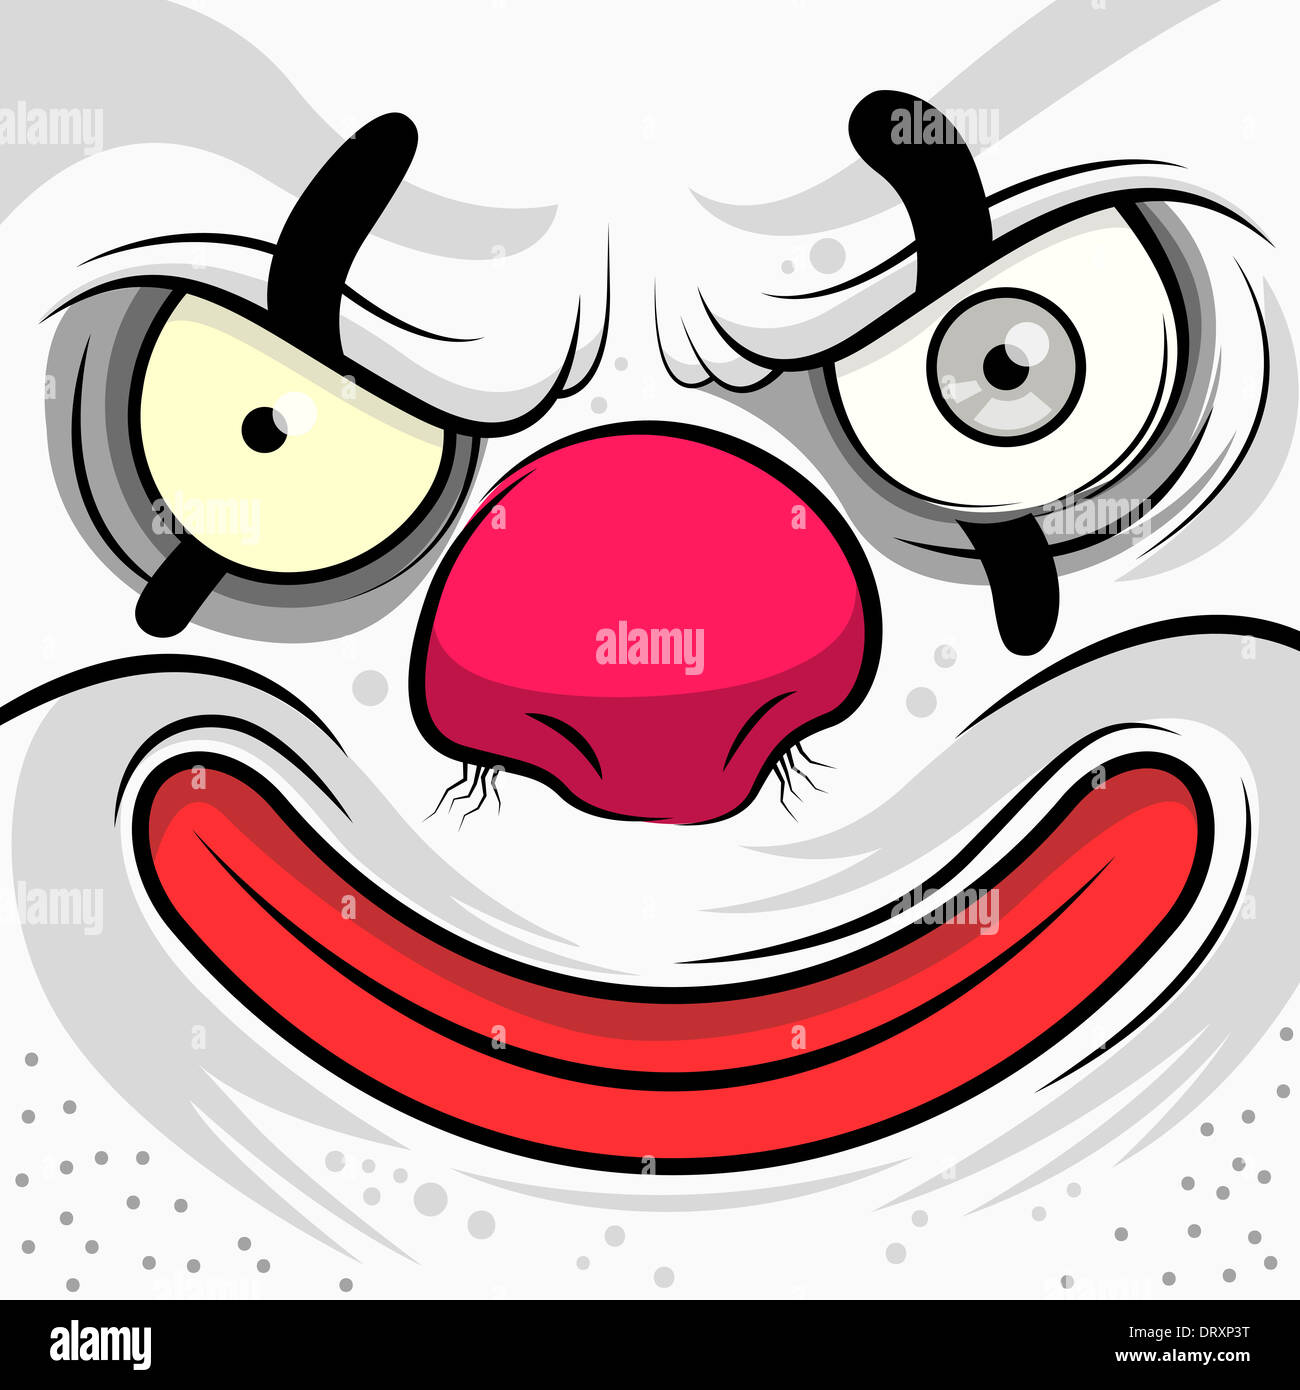 Quadratische Faced böser Clown - Vektor-illustration Stockbild